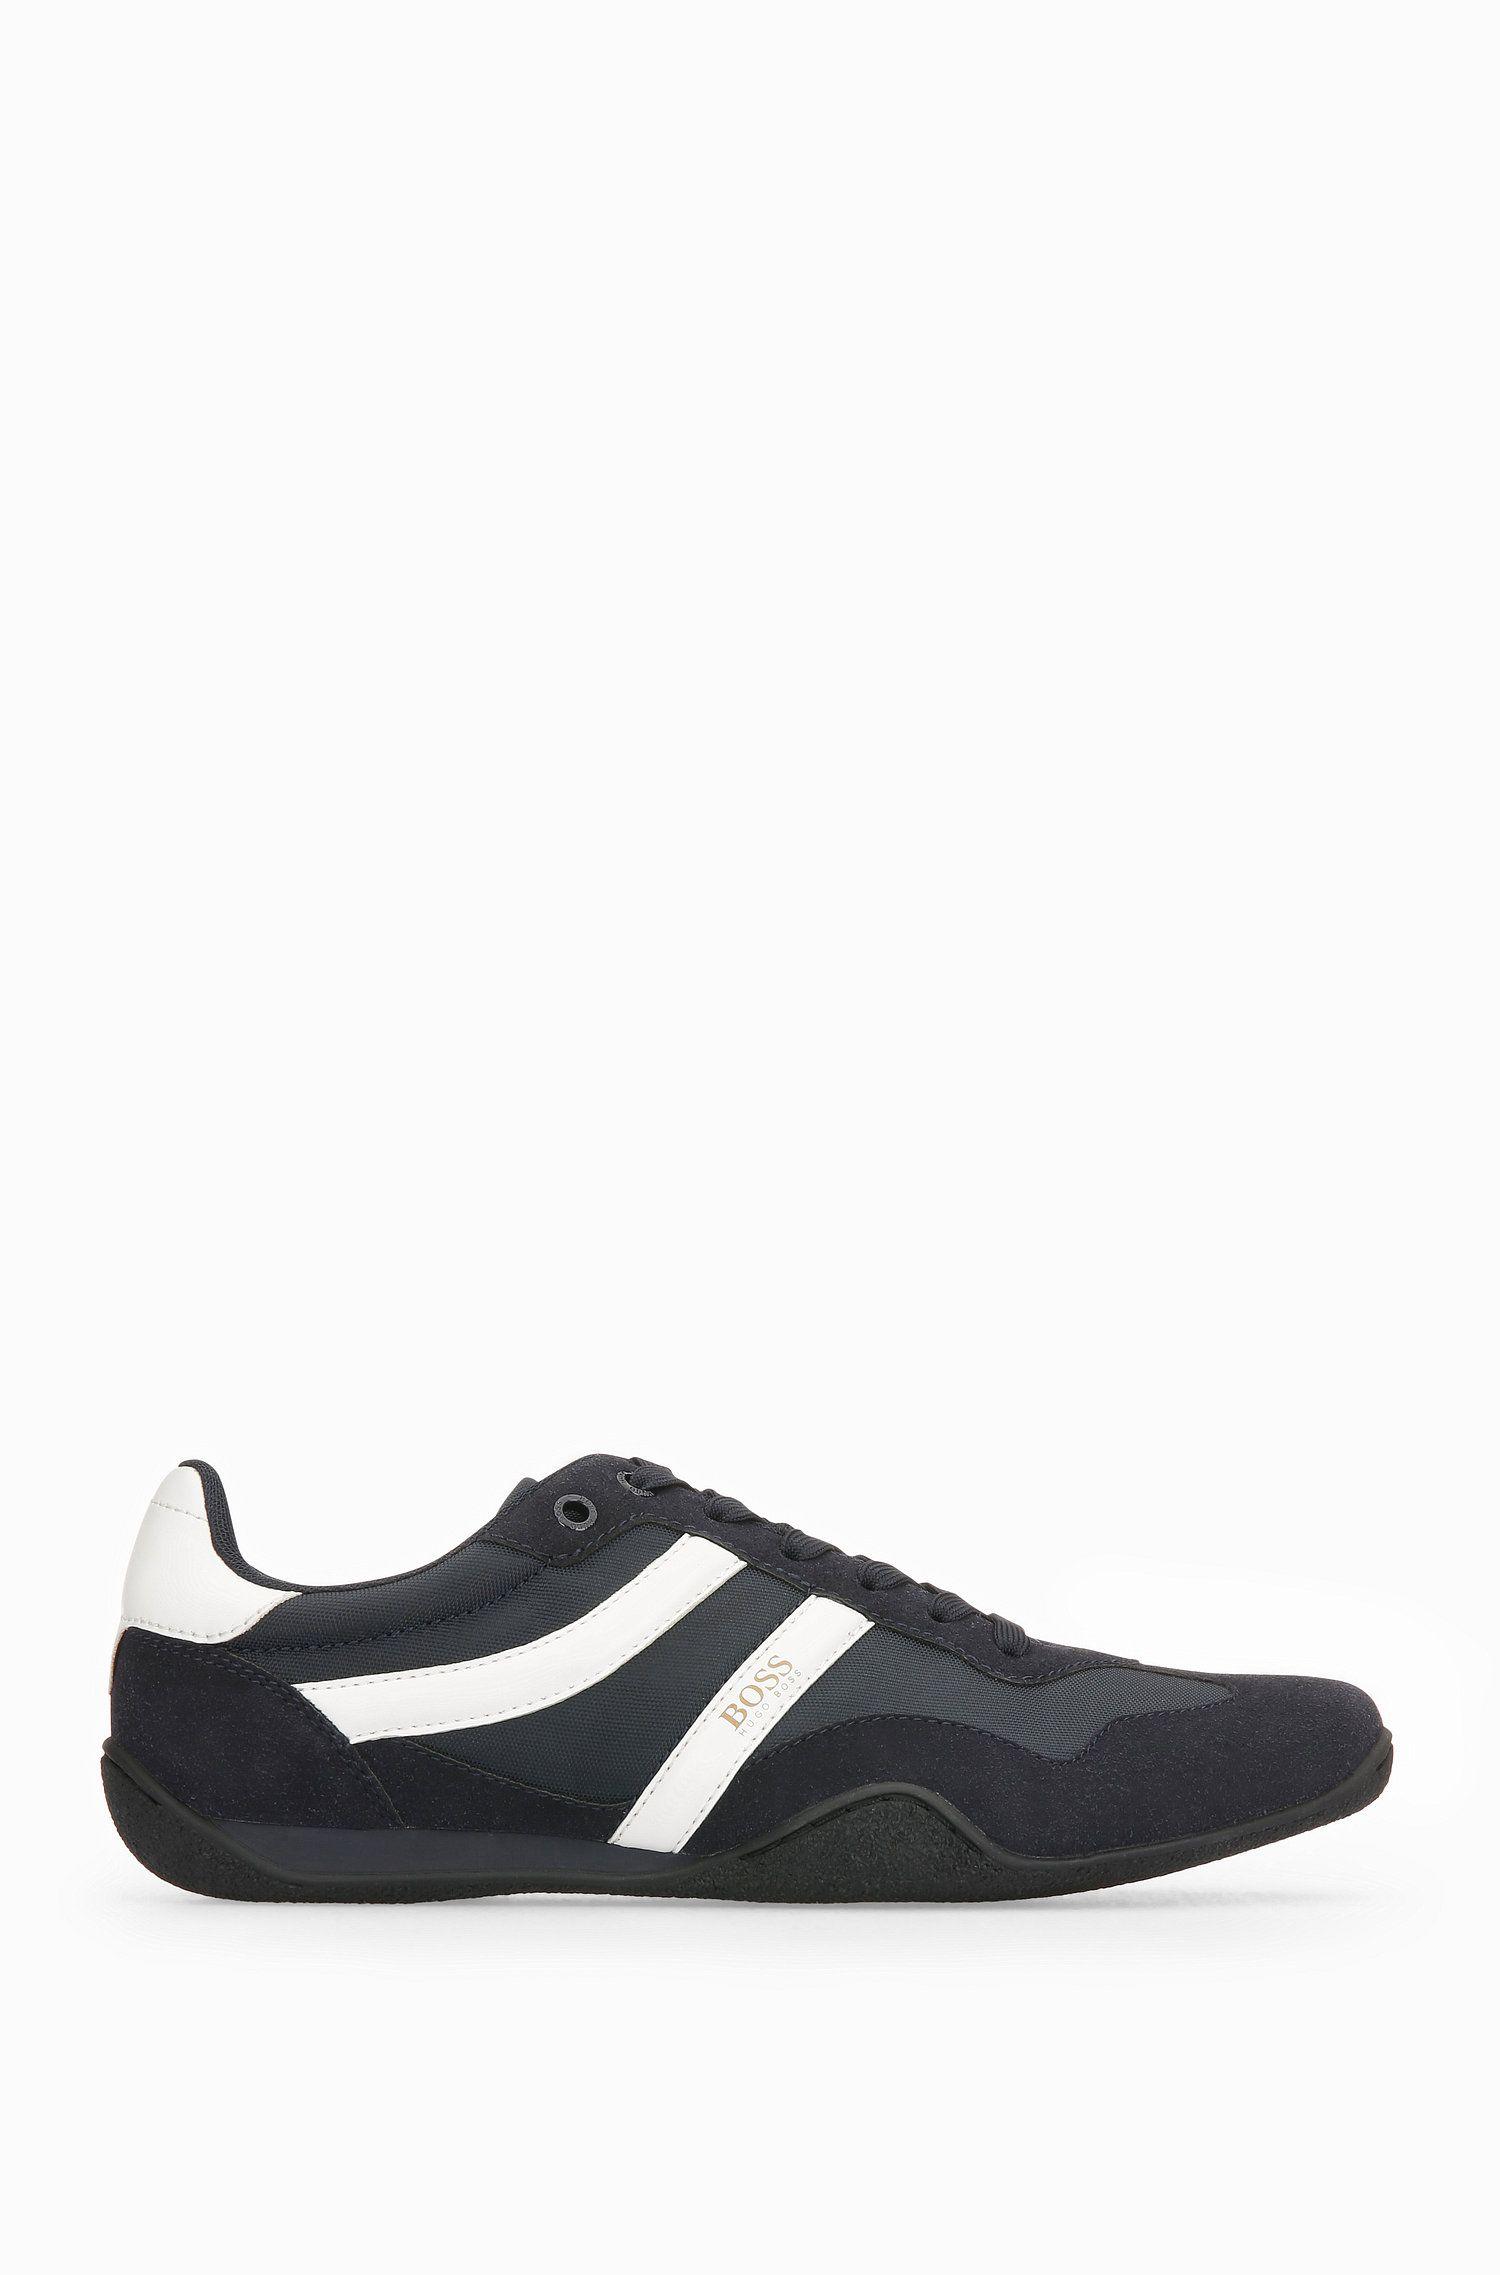 Sneakers aus Material-Mix mit leichter EVA-Mittelsohle